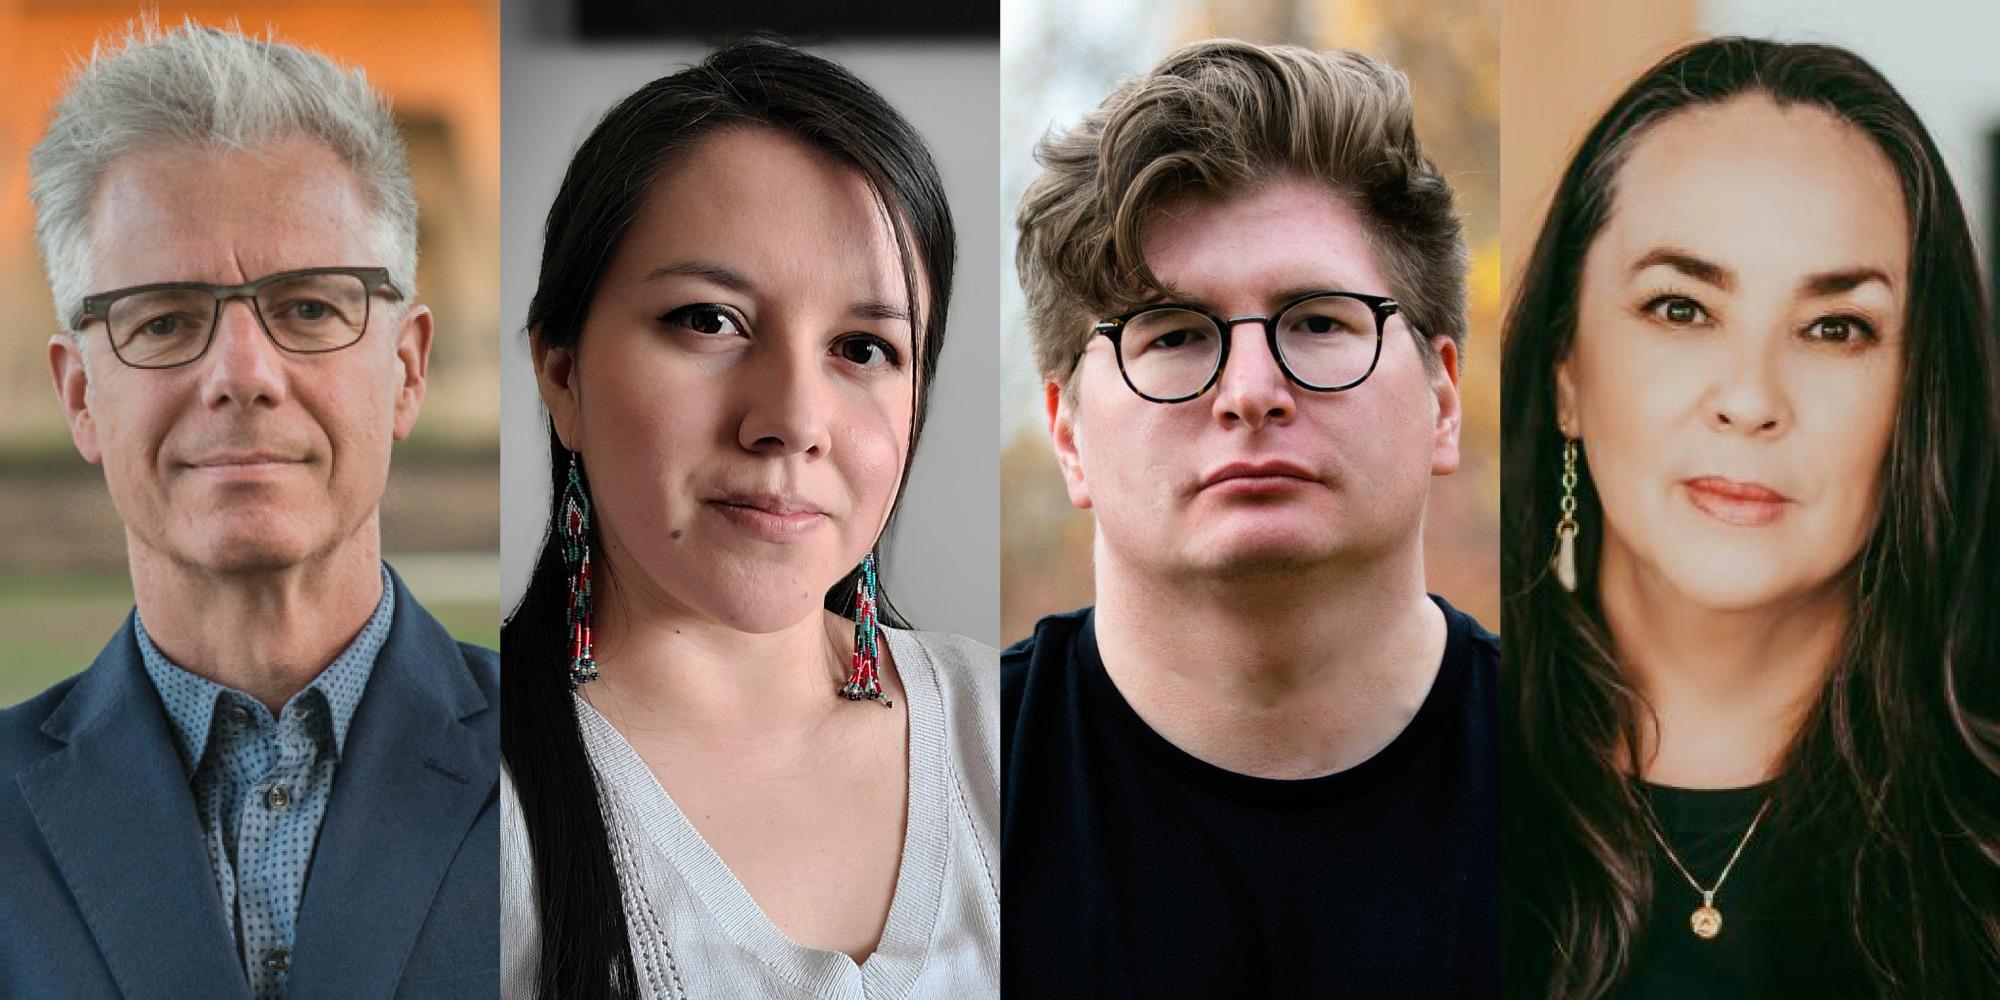 https://www.arts.ubc.ca/wp-content/uploads/sites/24/2021/06/2021-AC-IndigenousHistoryMonth-WebEditorial2000x1000px-v.1.jpg